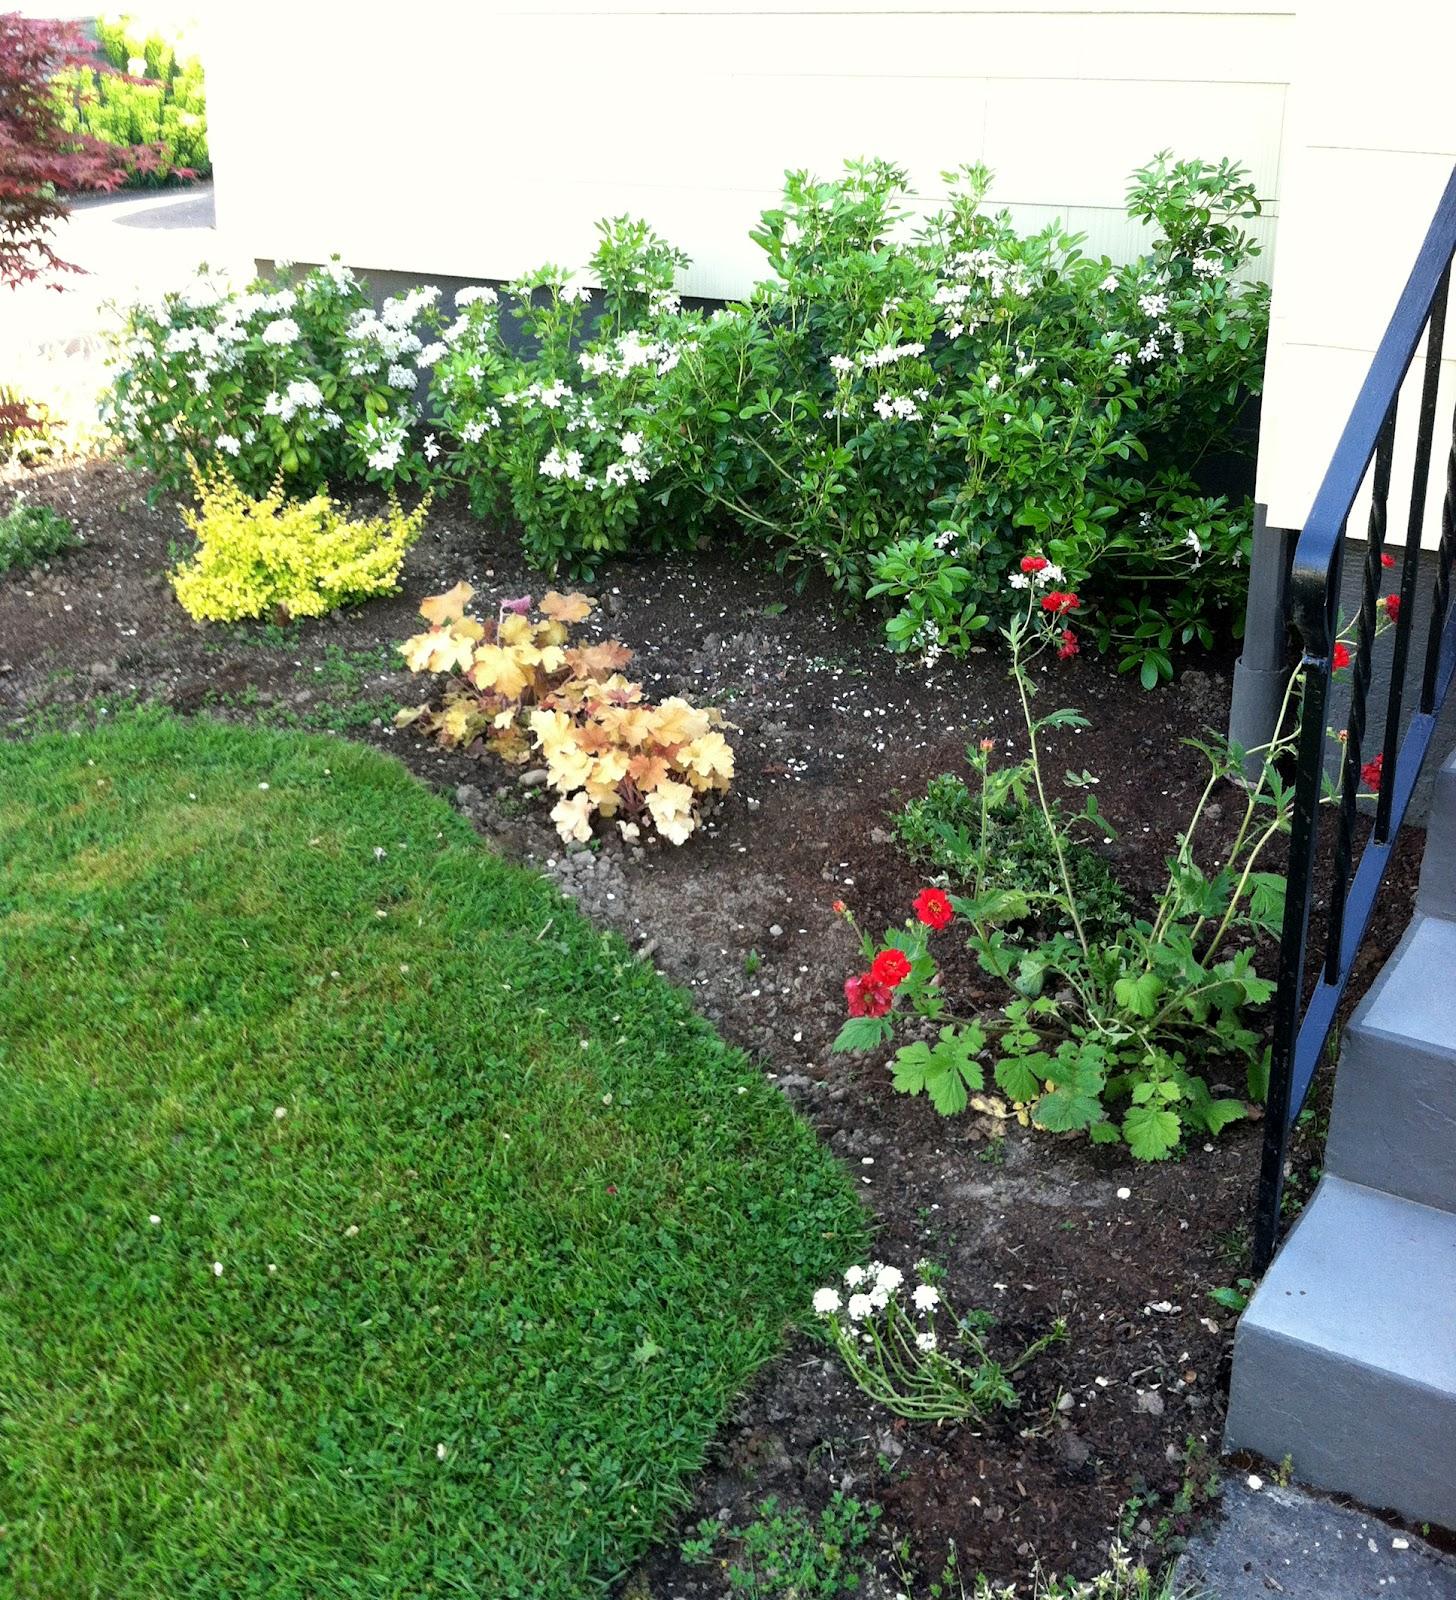 a home in the making renovate front yard landscape updates. Black Bedroom Furniture Sets. Home Design Ideas